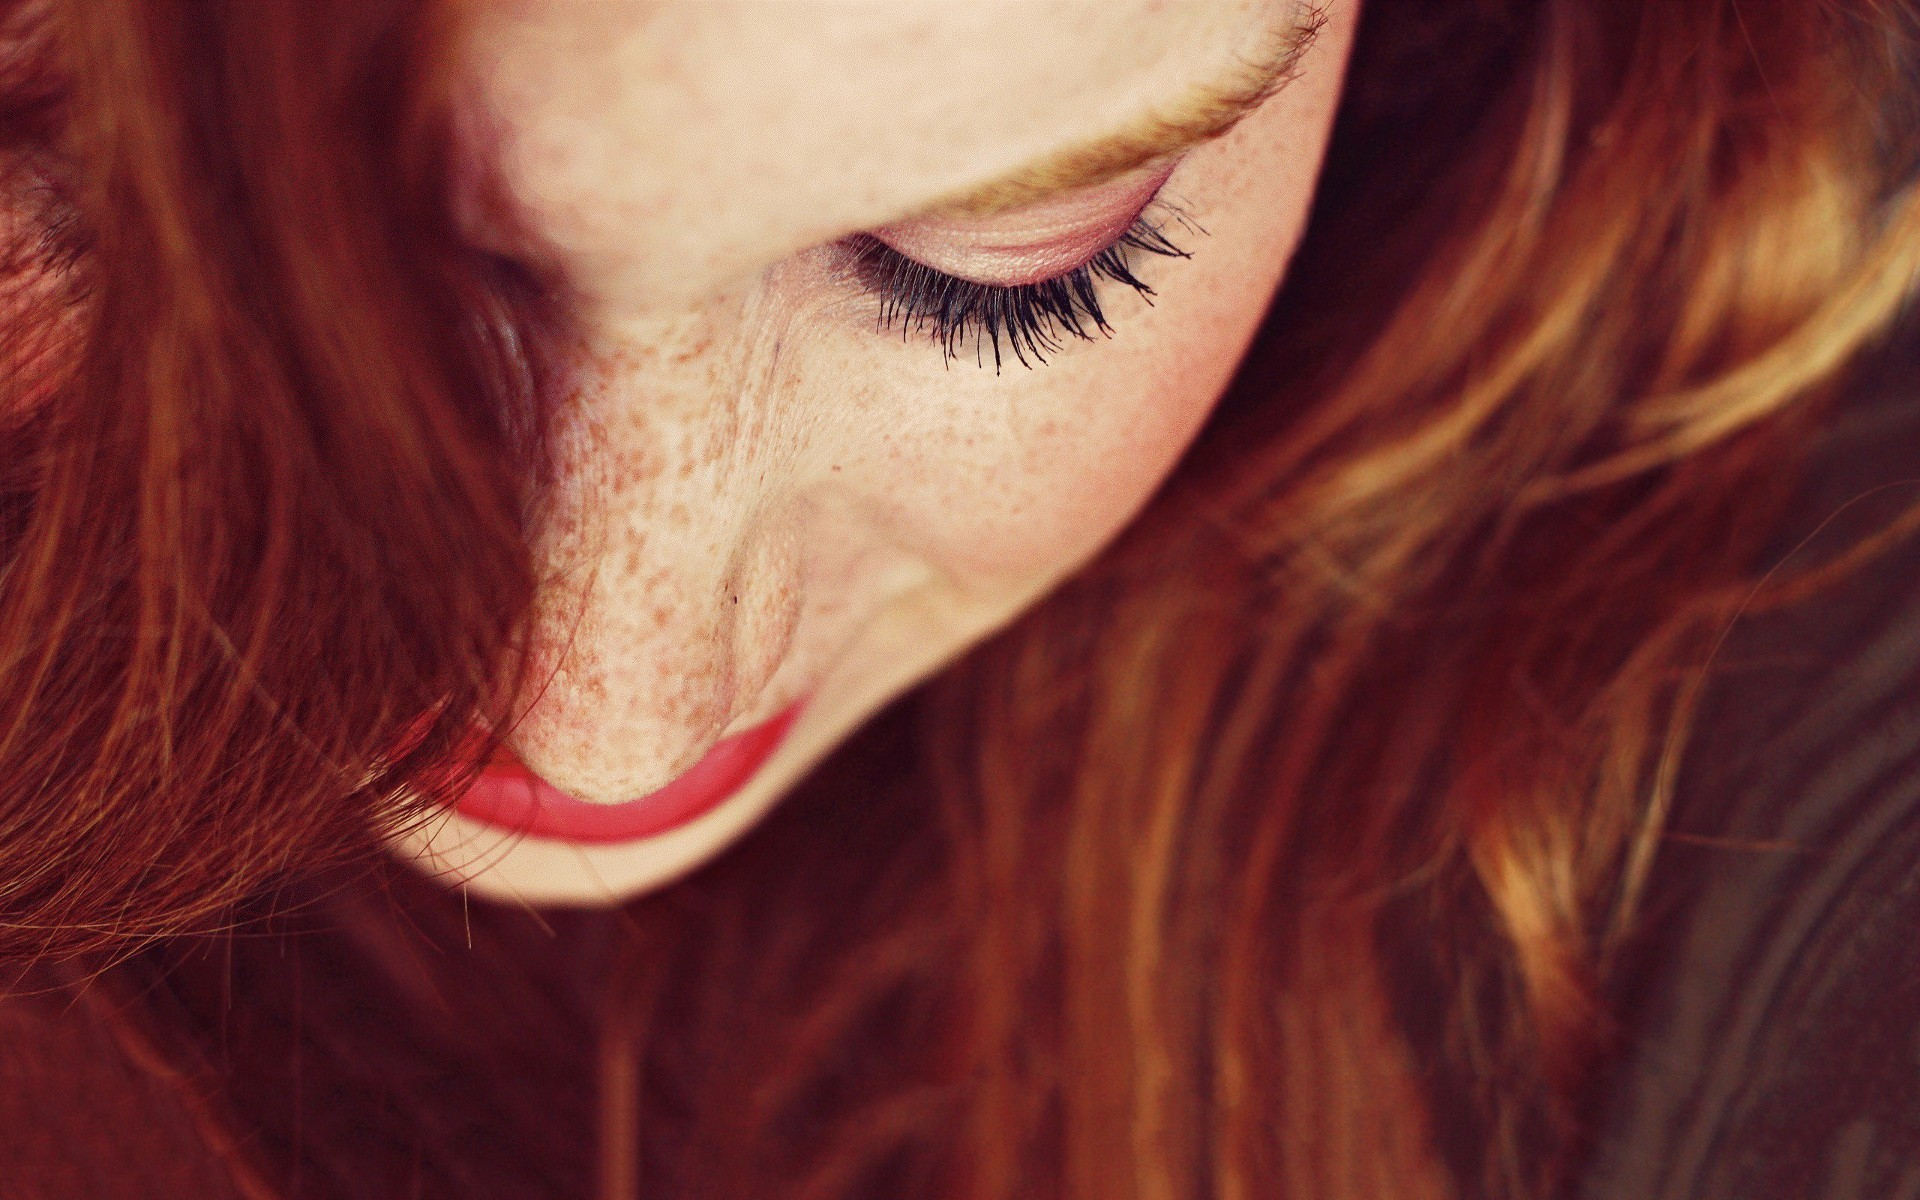 Redhead Up Close Wallpaper 9068